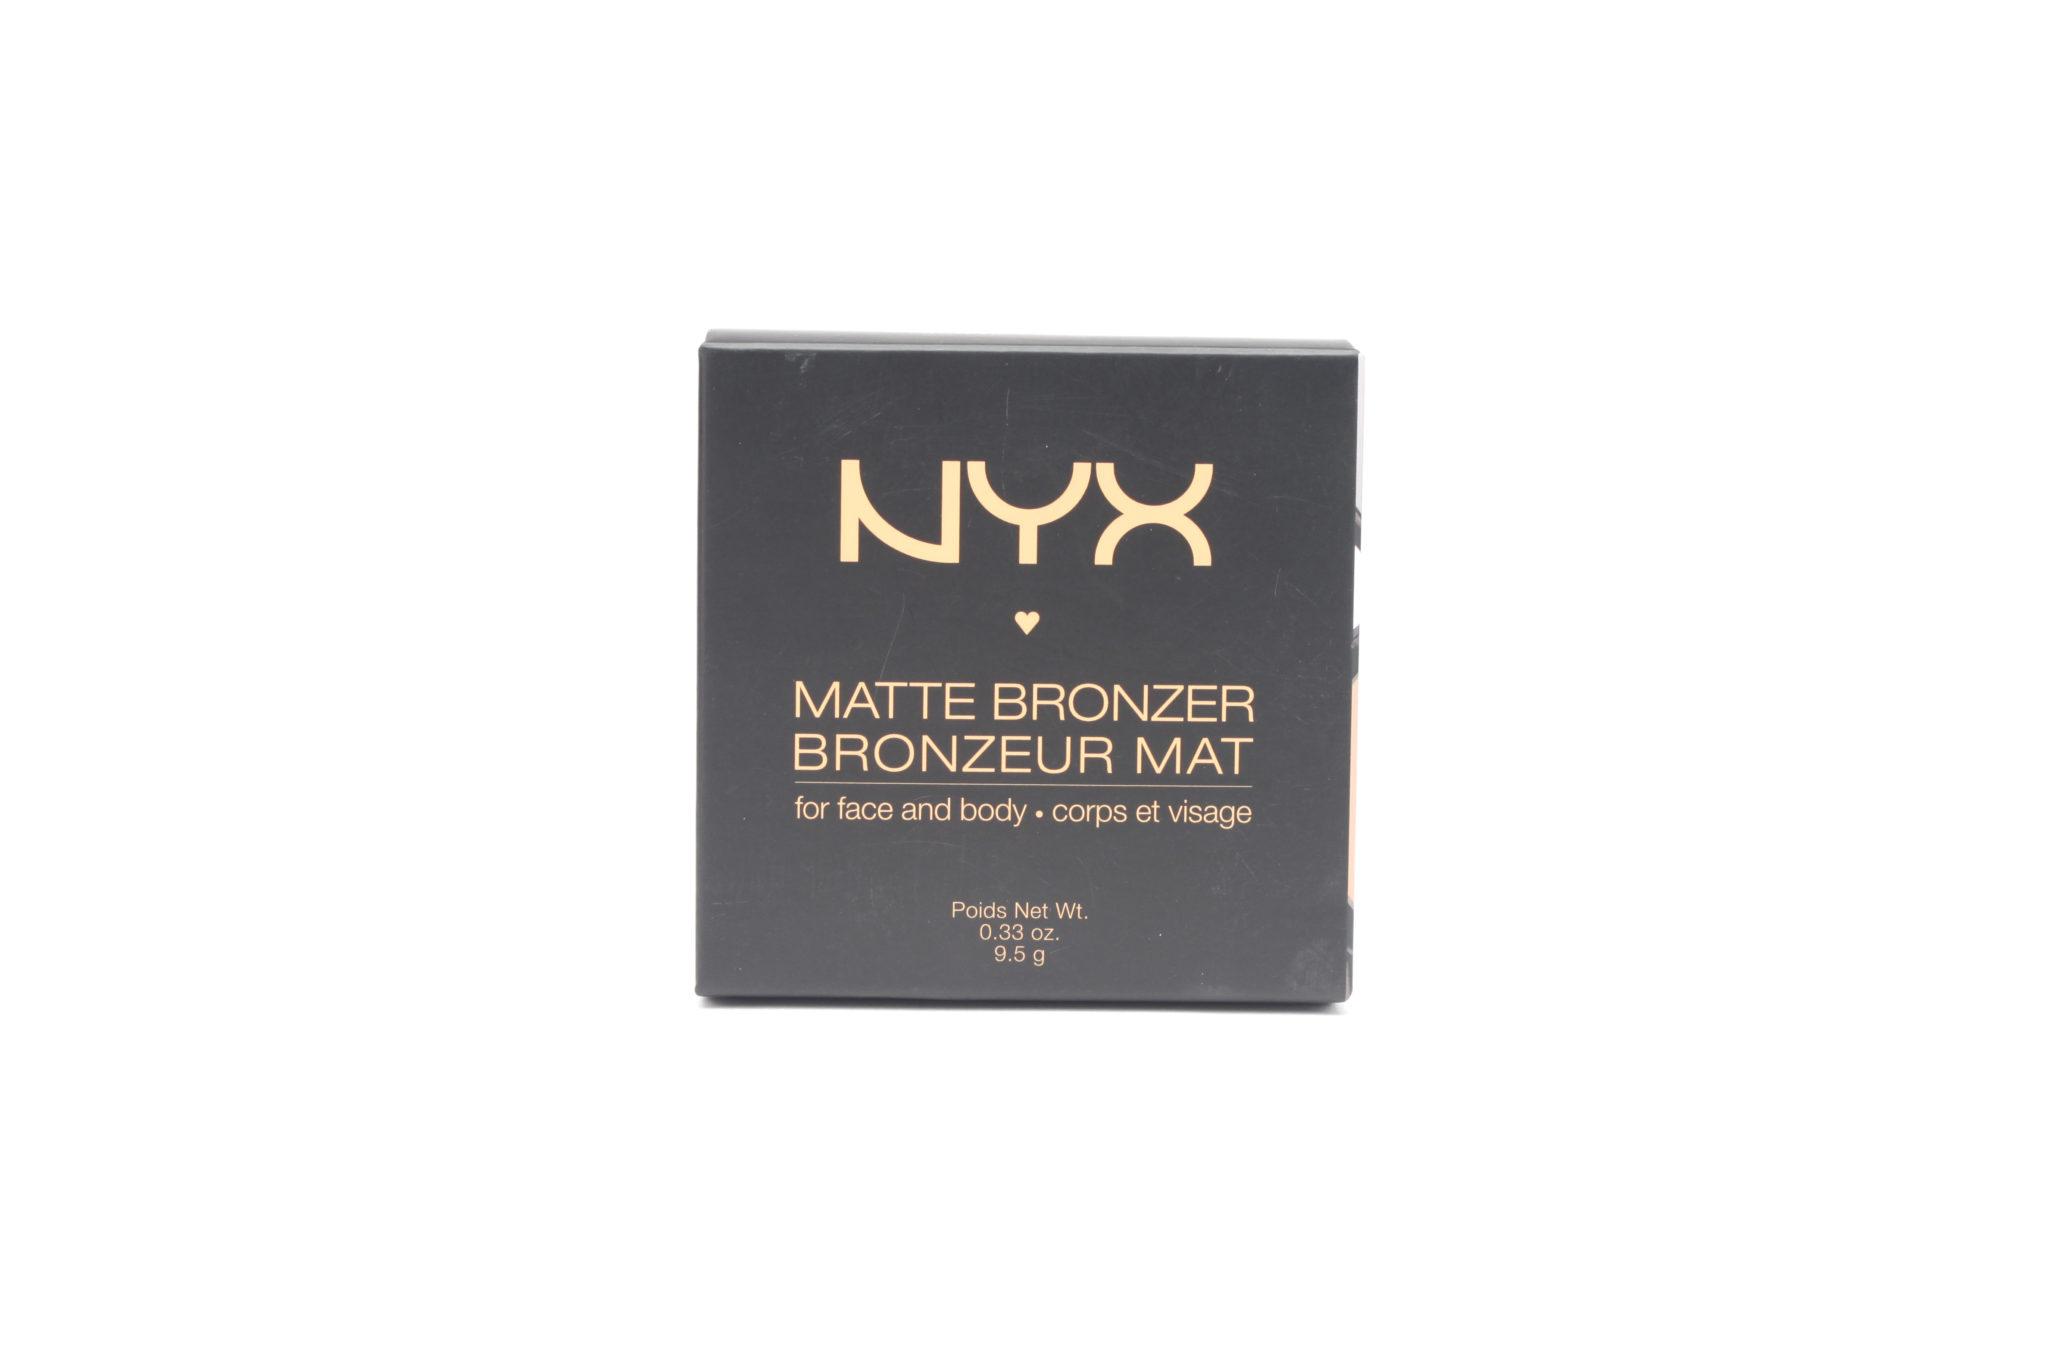 63854 Matte Bronzer MBB01 LightClair 0.33 oz Front (2)